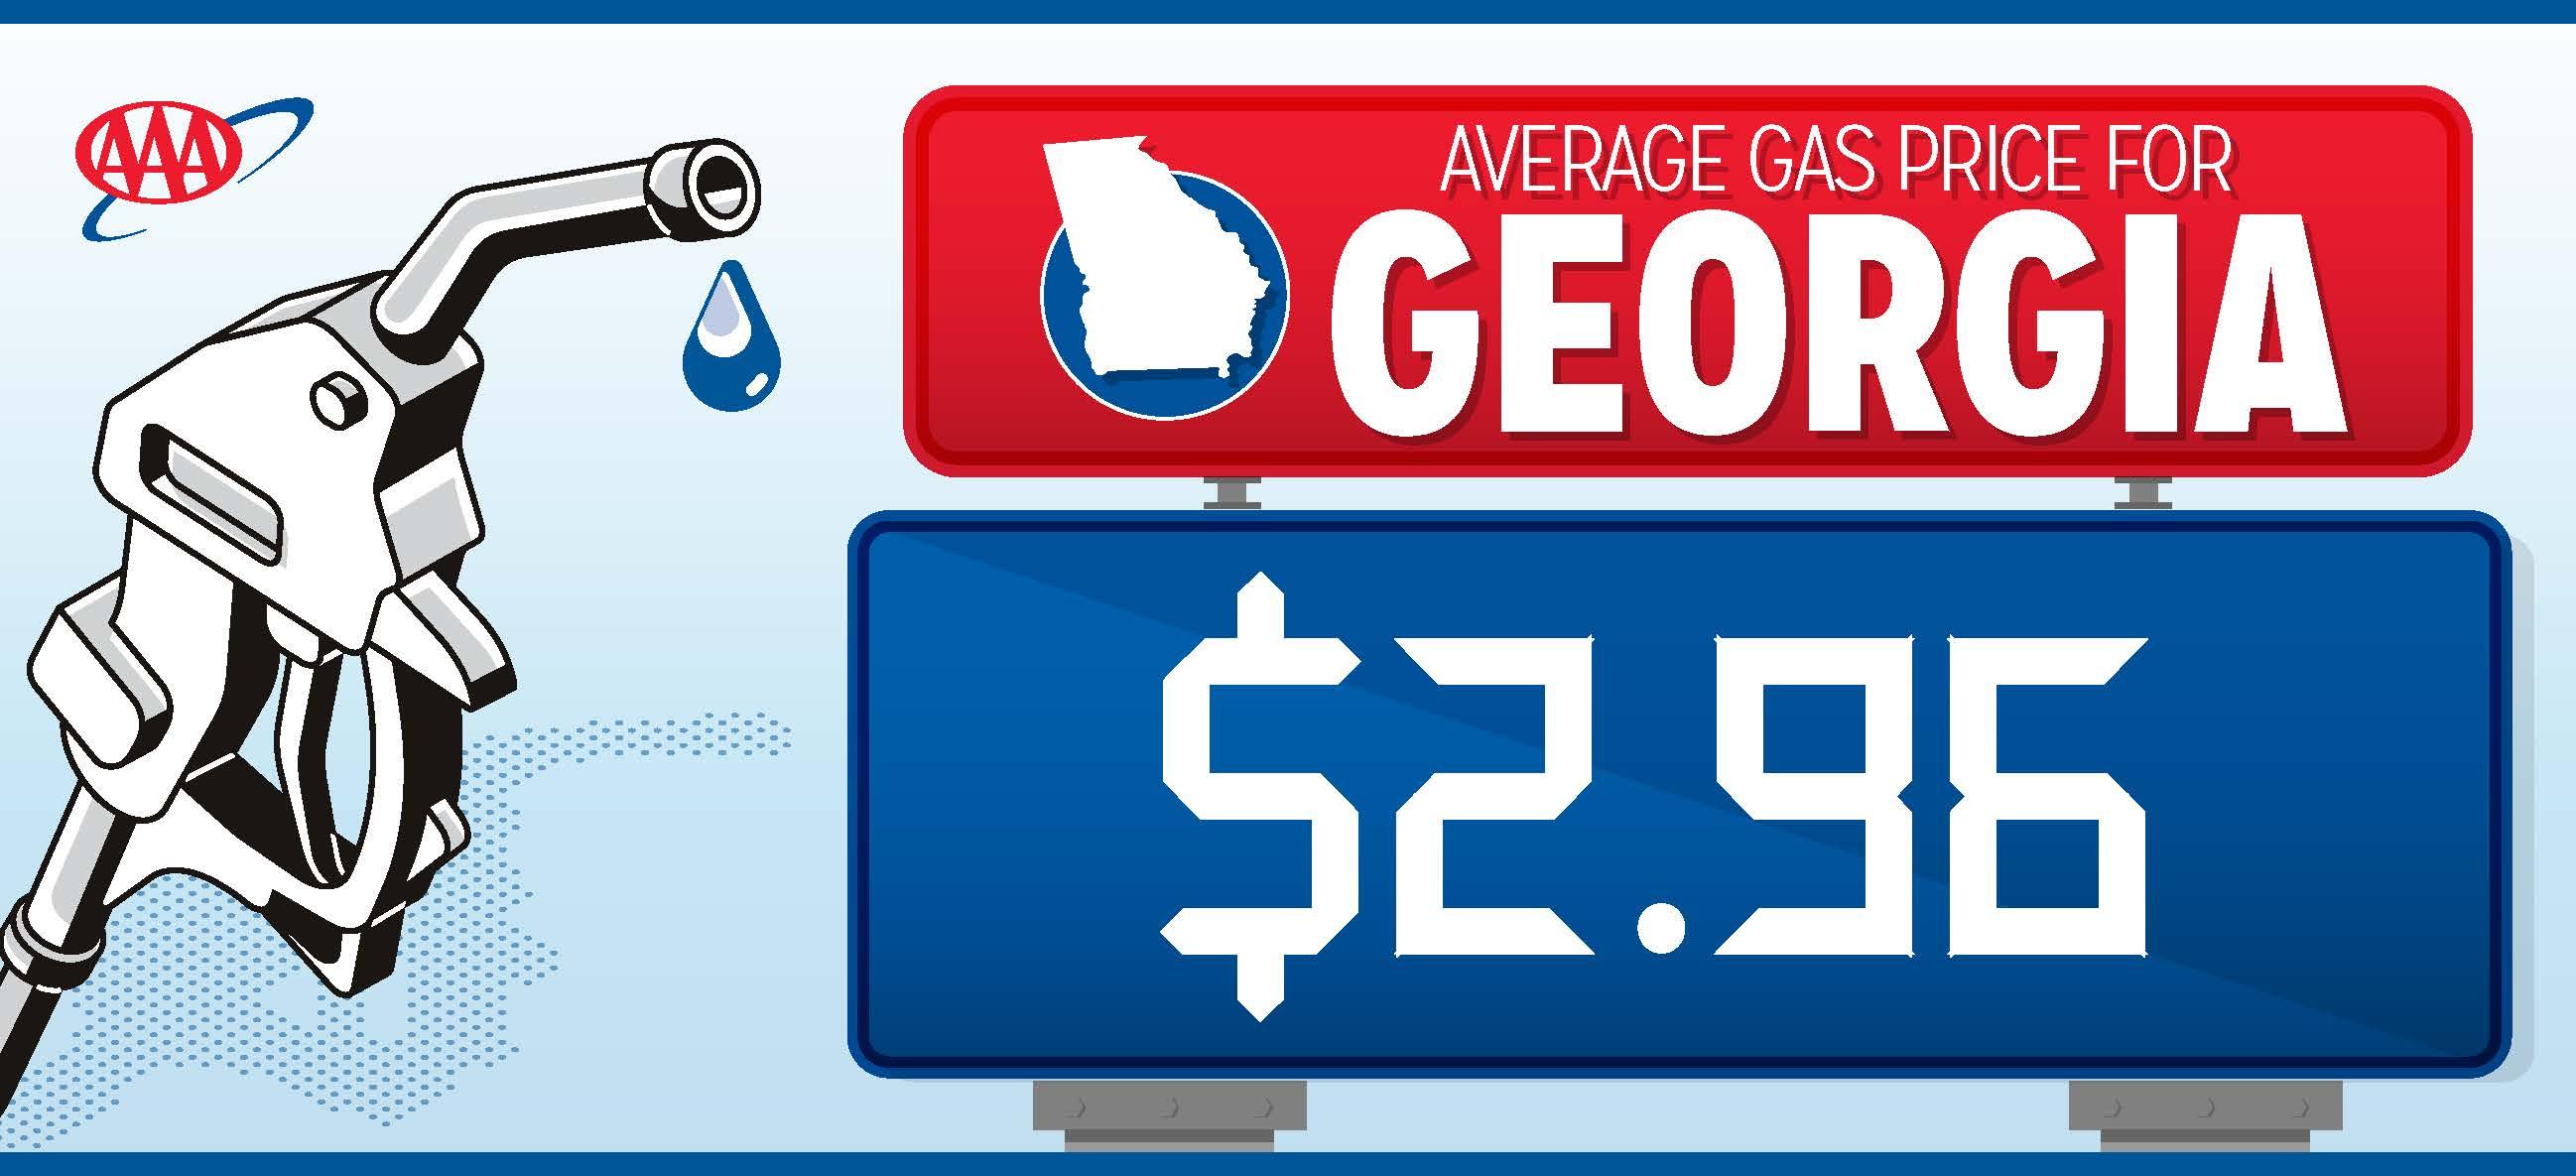 GA_Single Price 2.jpg